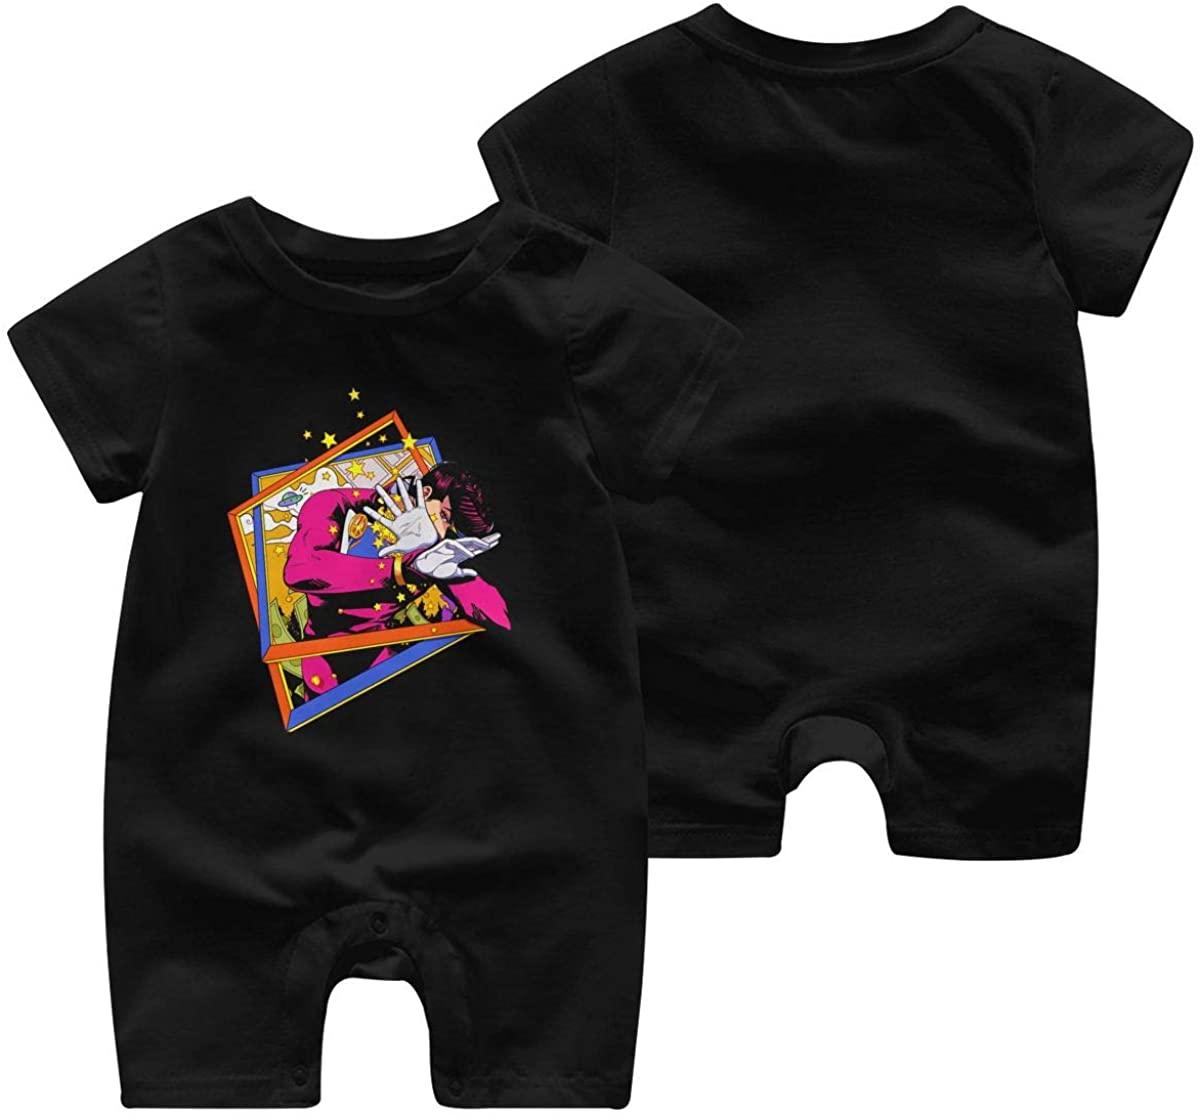 5husihai JoJo's Bizarre Adventure 1-24 Months Boy Girl Baby Short Sleeve Creeper Jumpsuit Black